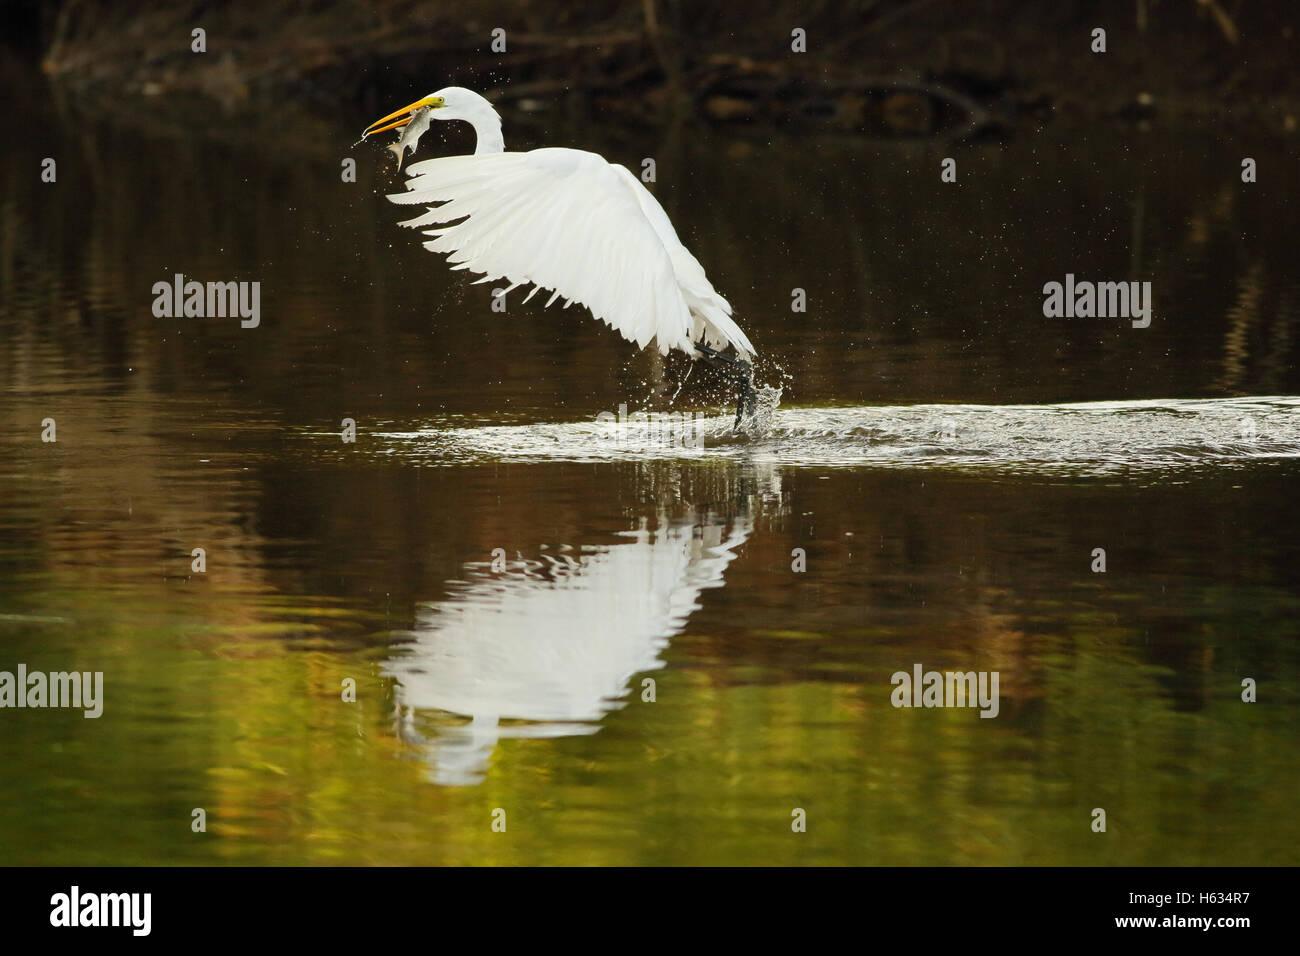 Great egret (Ardea alba) catching a fish in a stream in Guanacaste, Costa Rica, Central America. - Stock Image